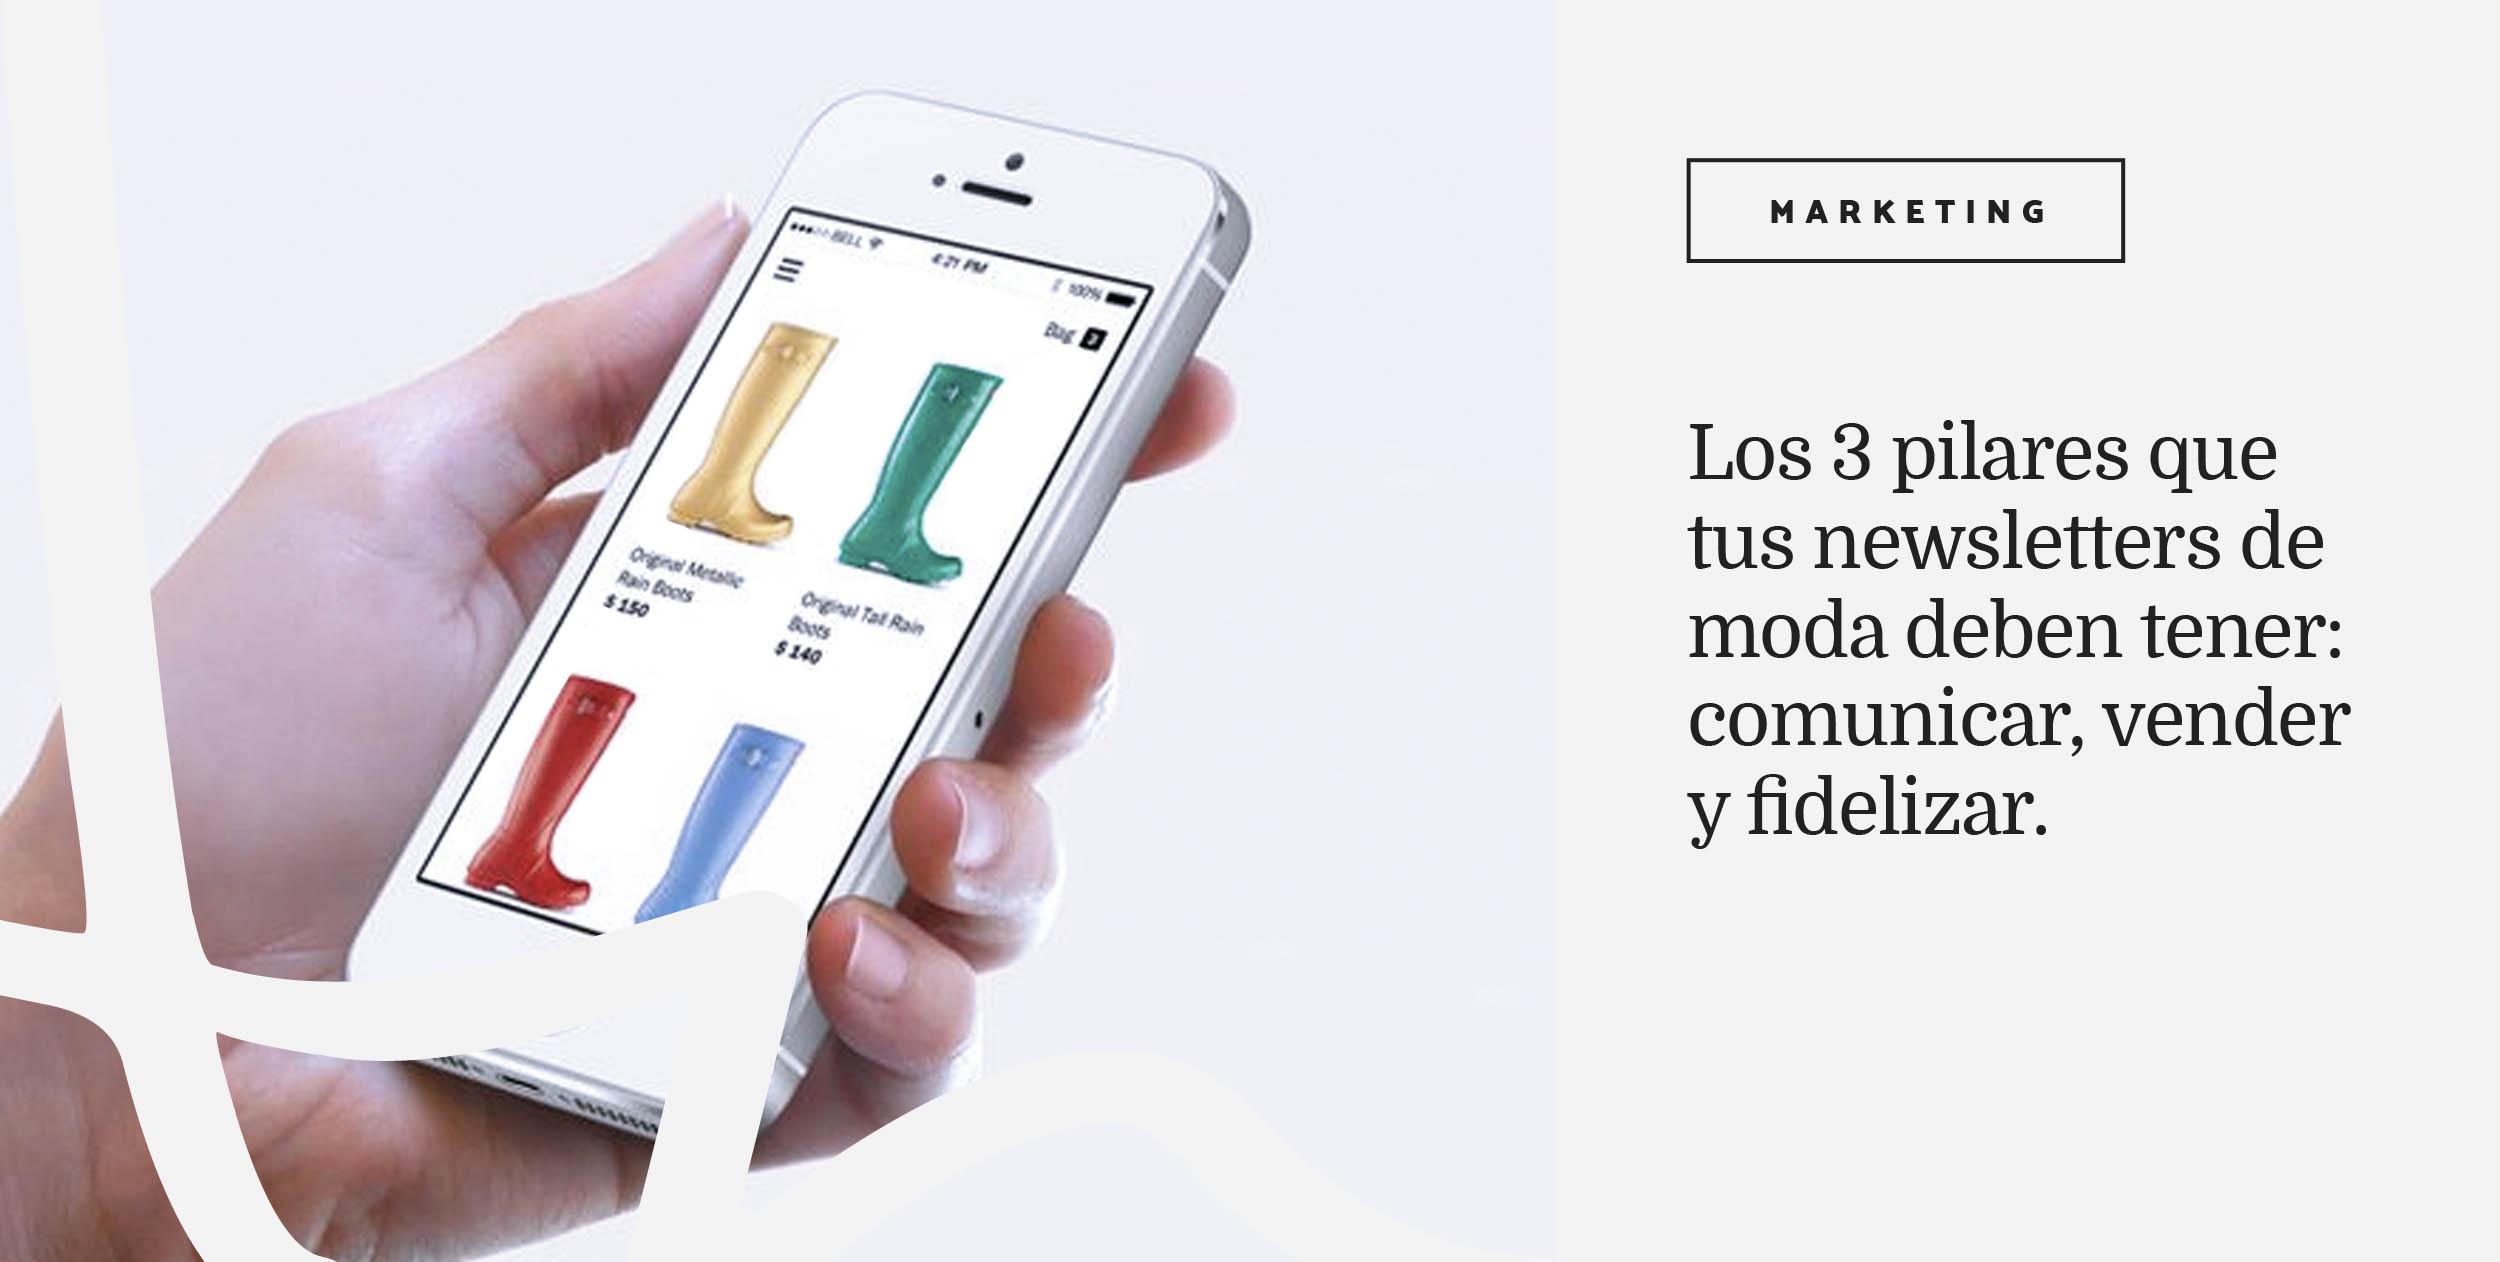 newsletters-en-moda-anadiazdelrio.com-consultora-marketing-de-moda.jpg